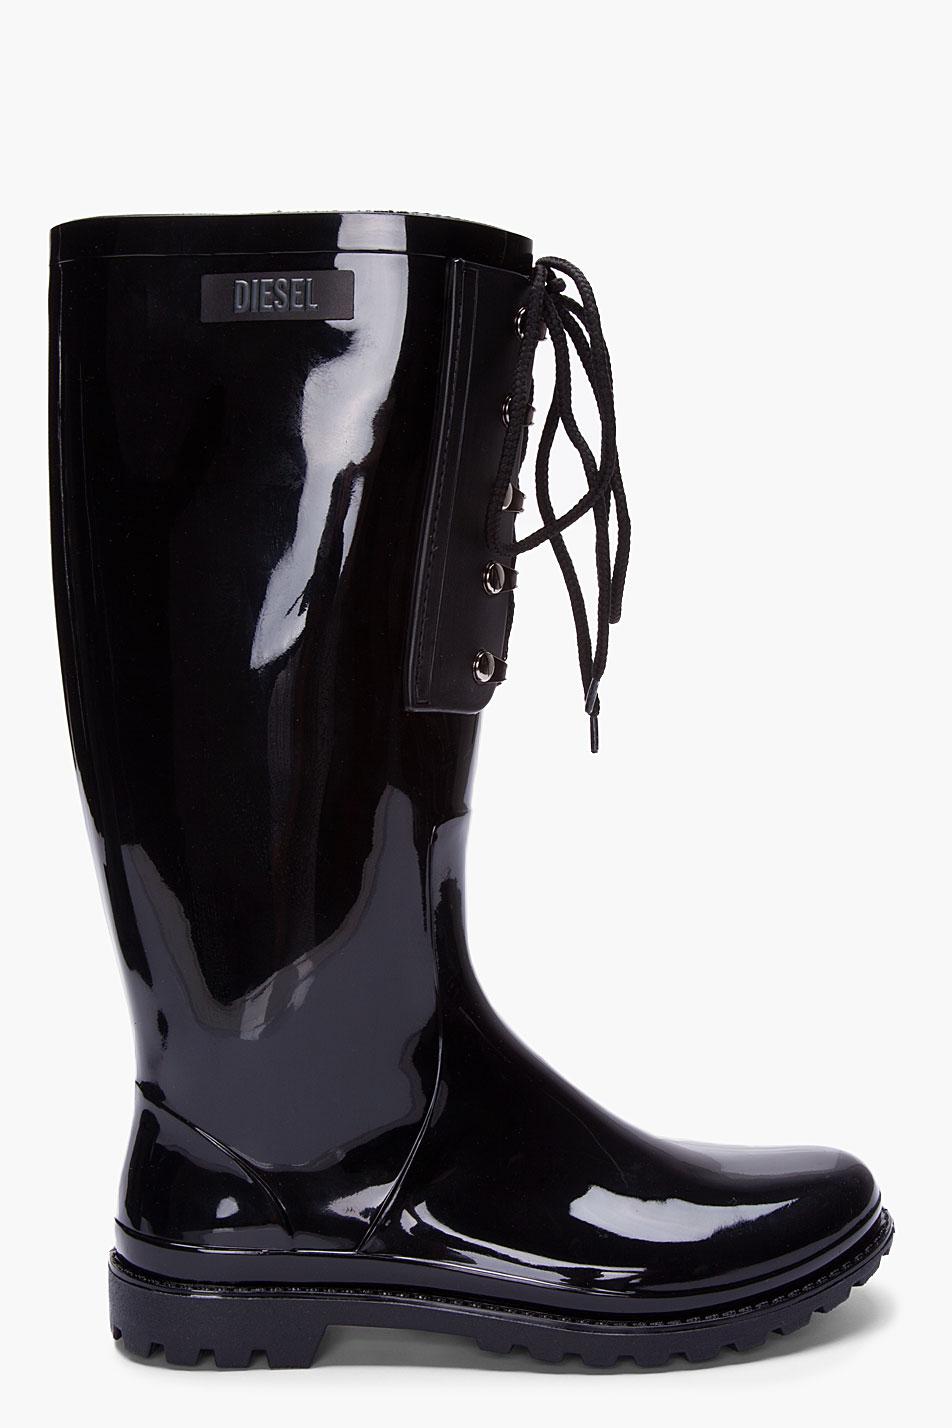 Diesel Black Patent Hook R Rainboots Lyst